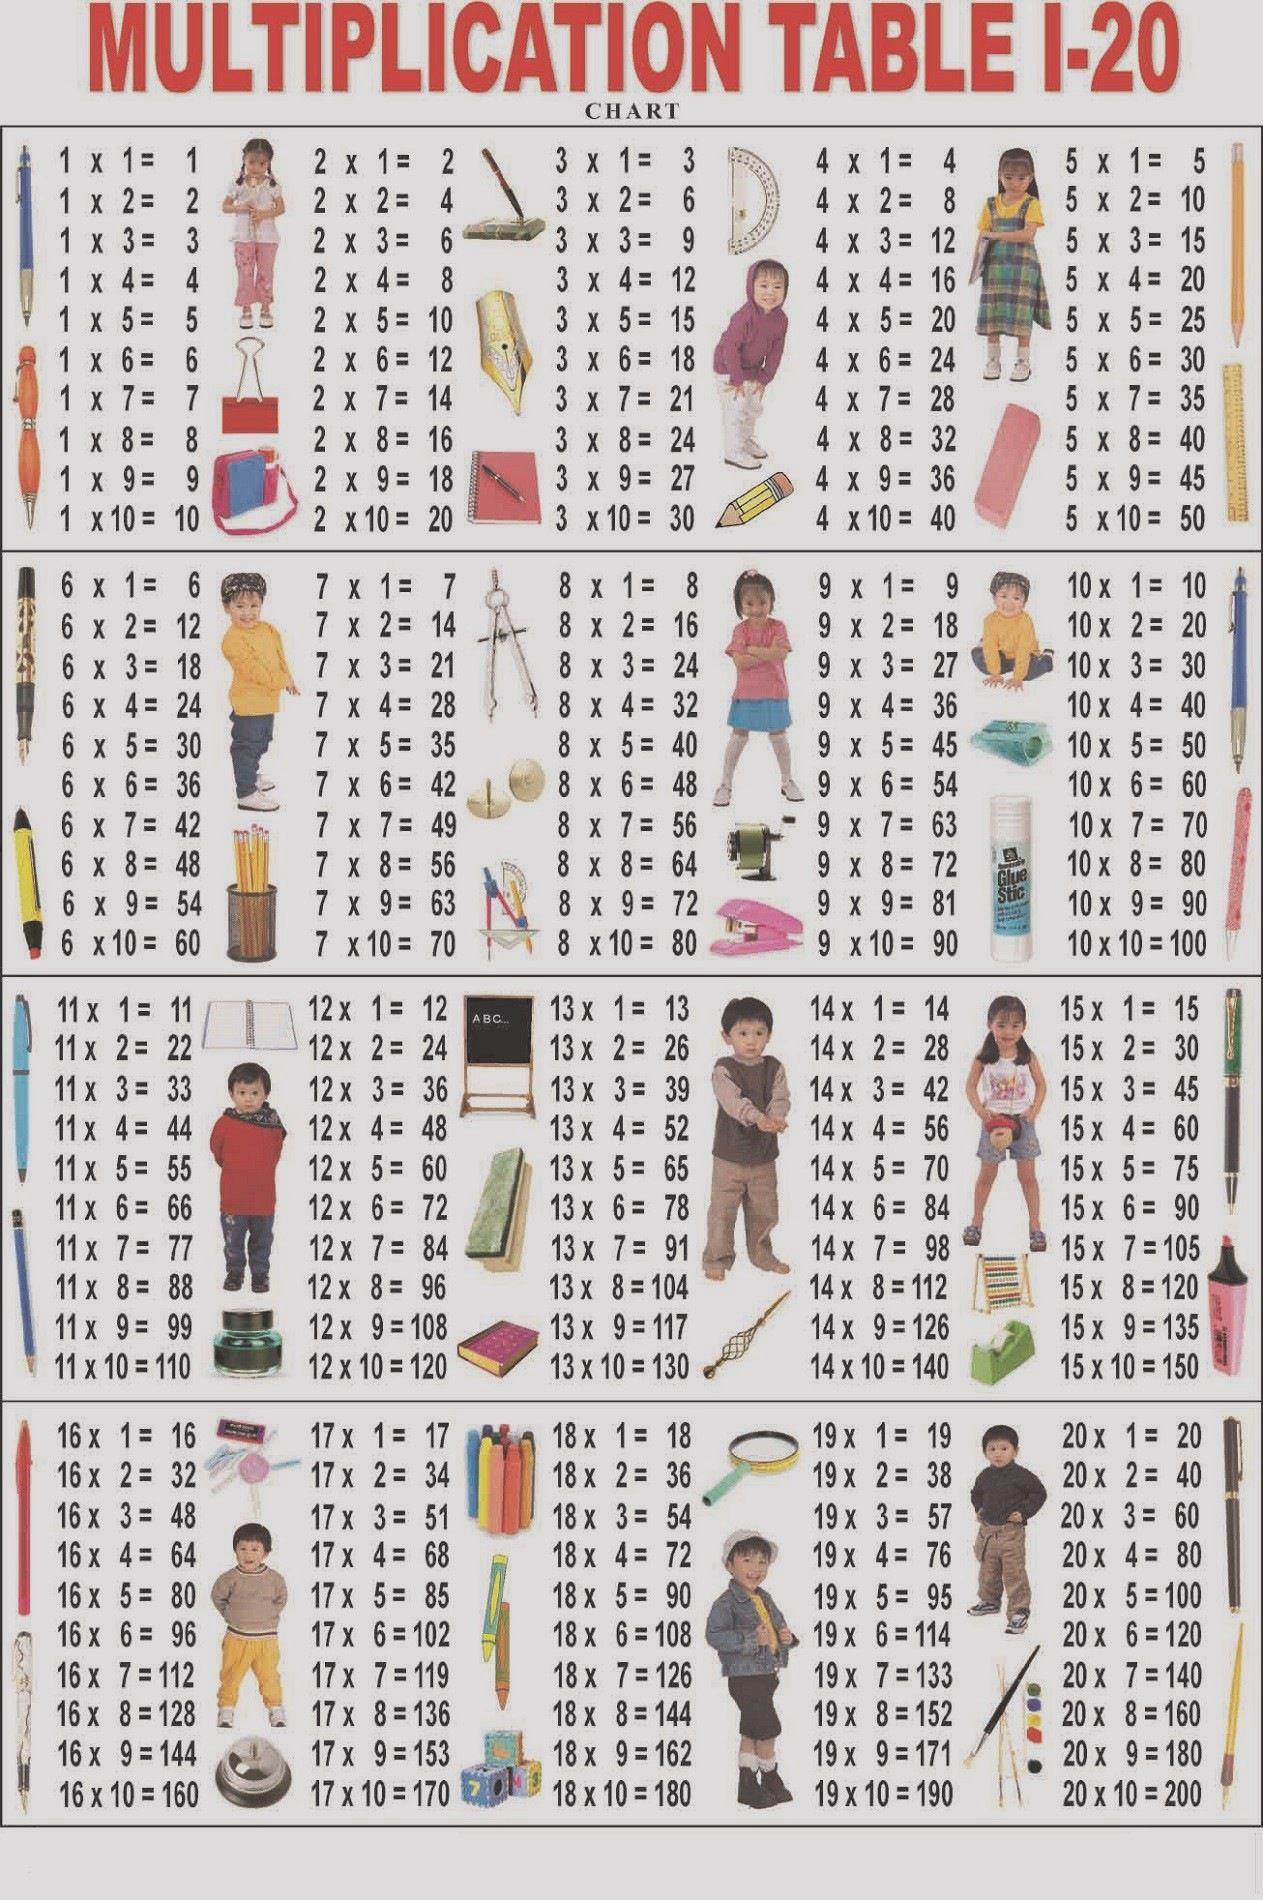 99 La Table De Multiplication Check More At Https Leonstafford